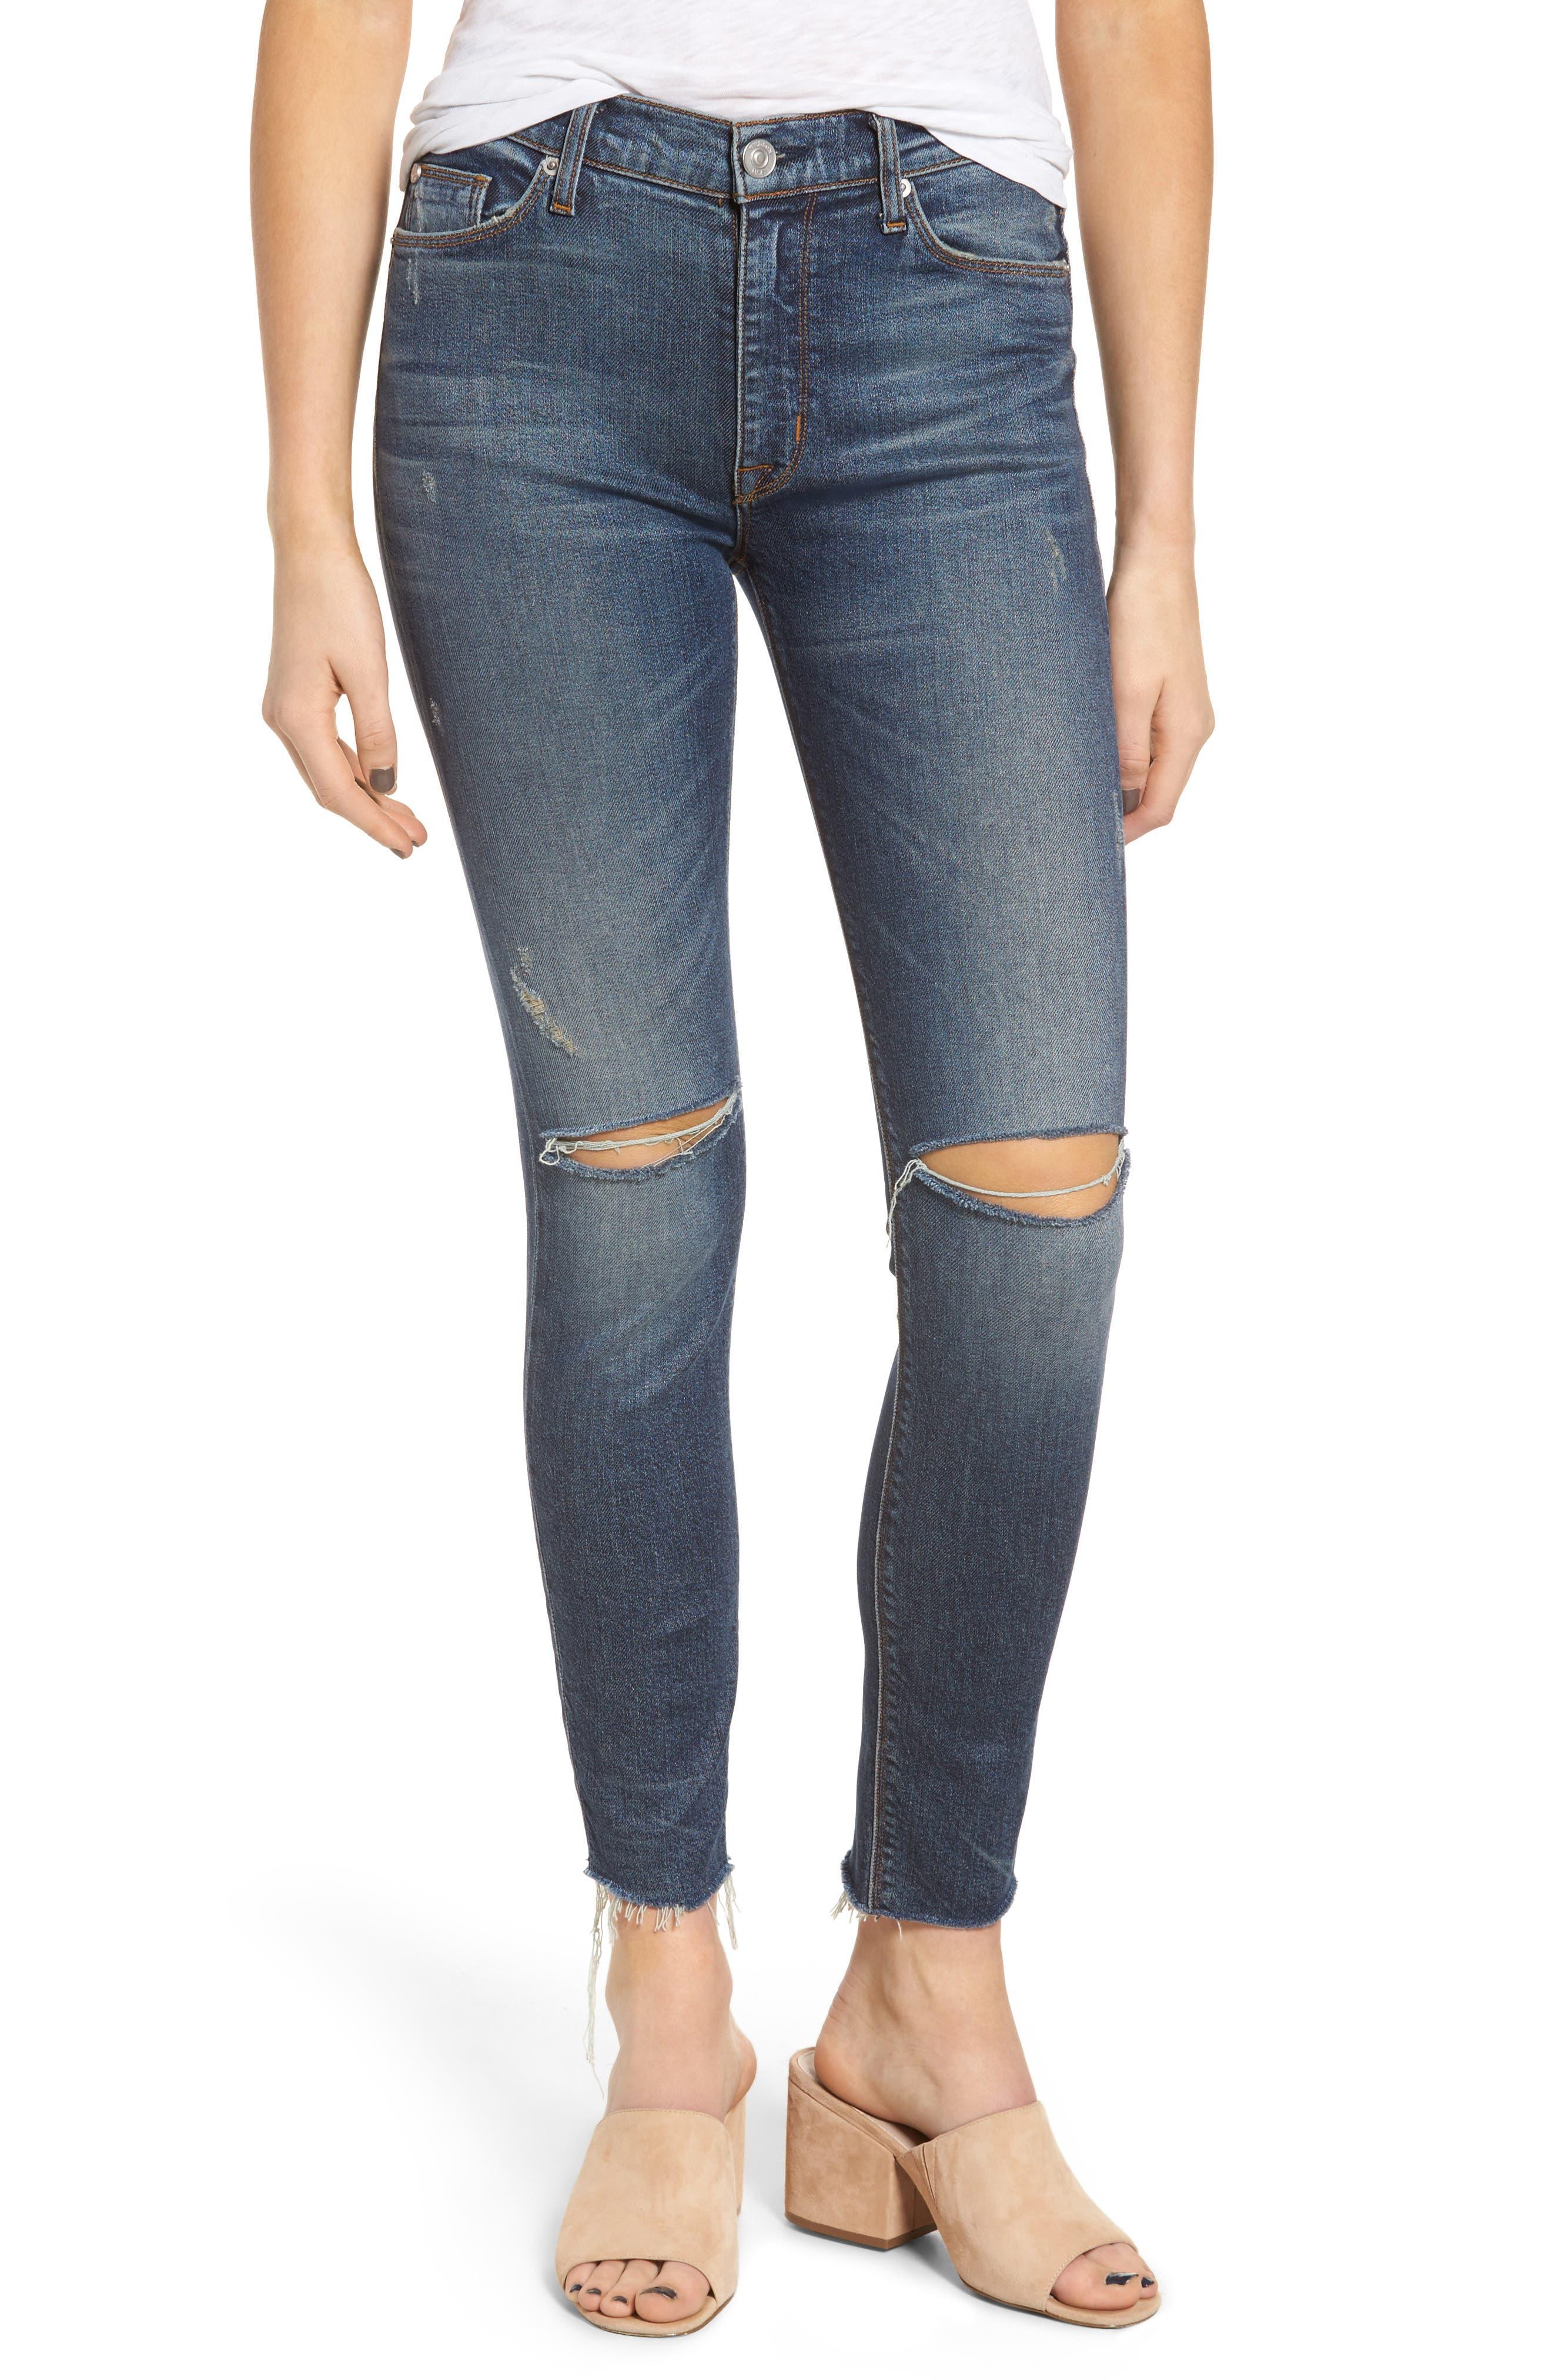 Barbara High Waist Skinny Jeans,                             Main thumbnail 1, color,                             Nowhere Girl